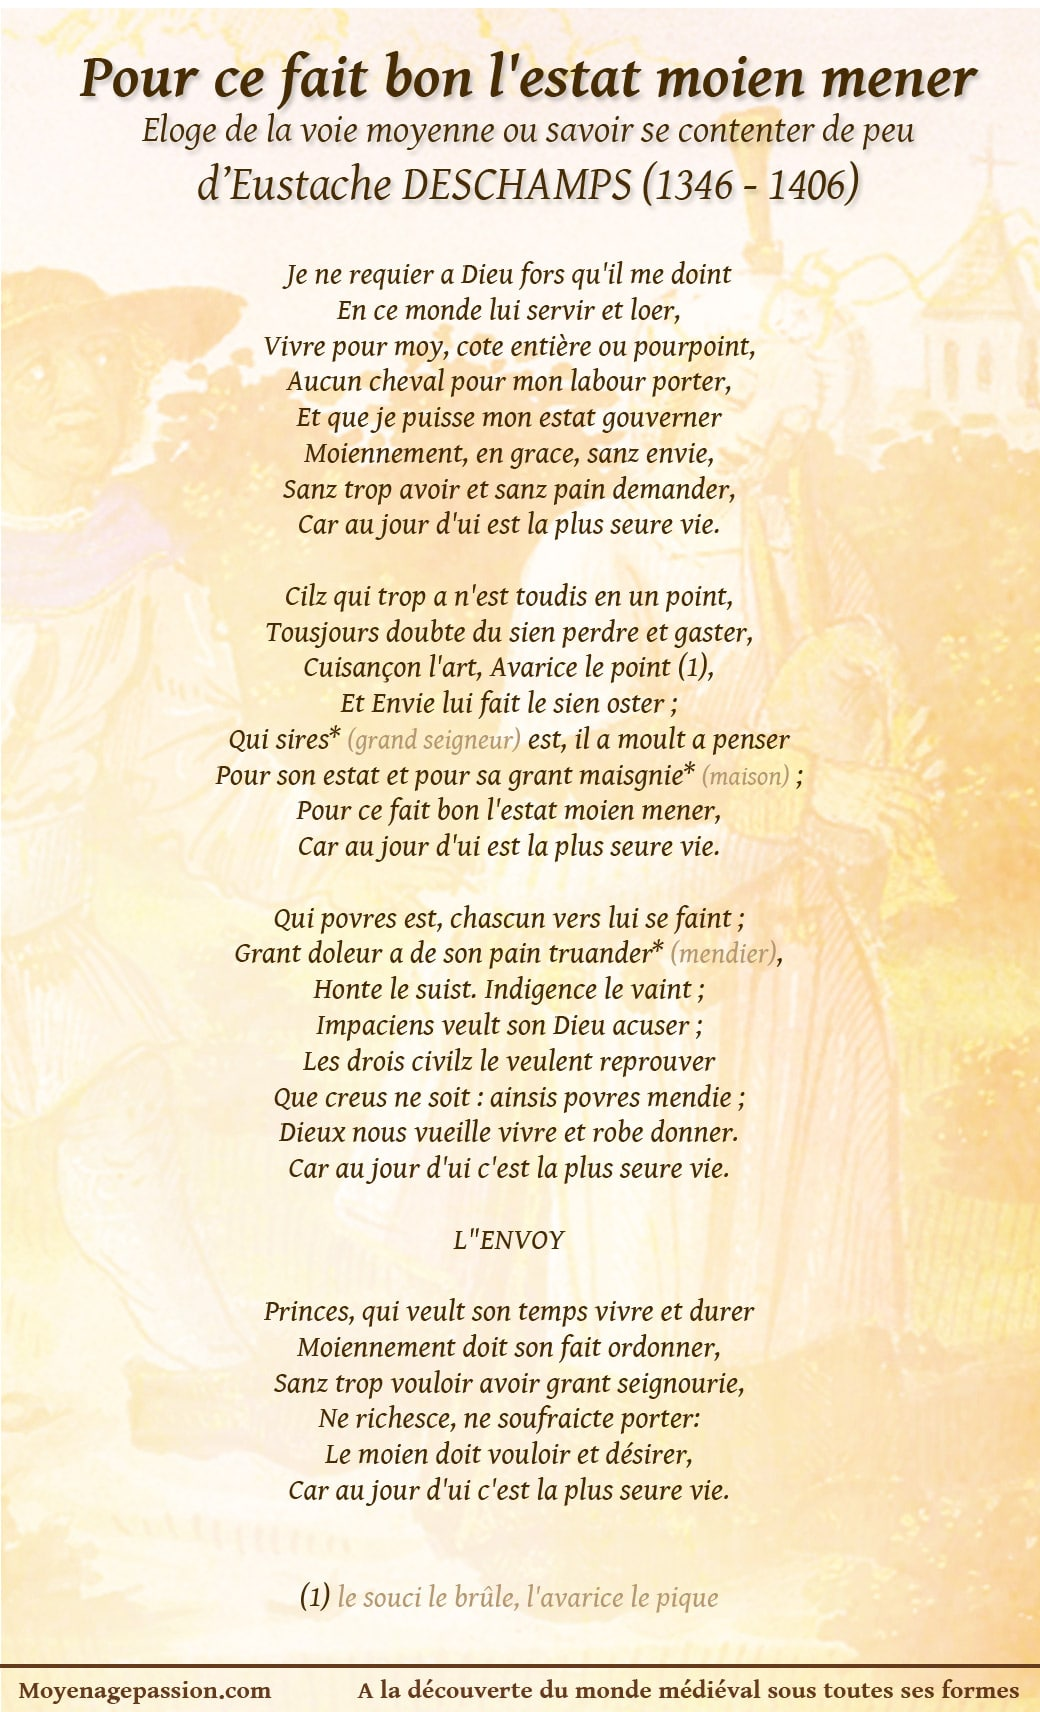 eustache_deschamps_poesie_litterature_moyen-age_XVe_ballade_medievale_mediocrite_moyen